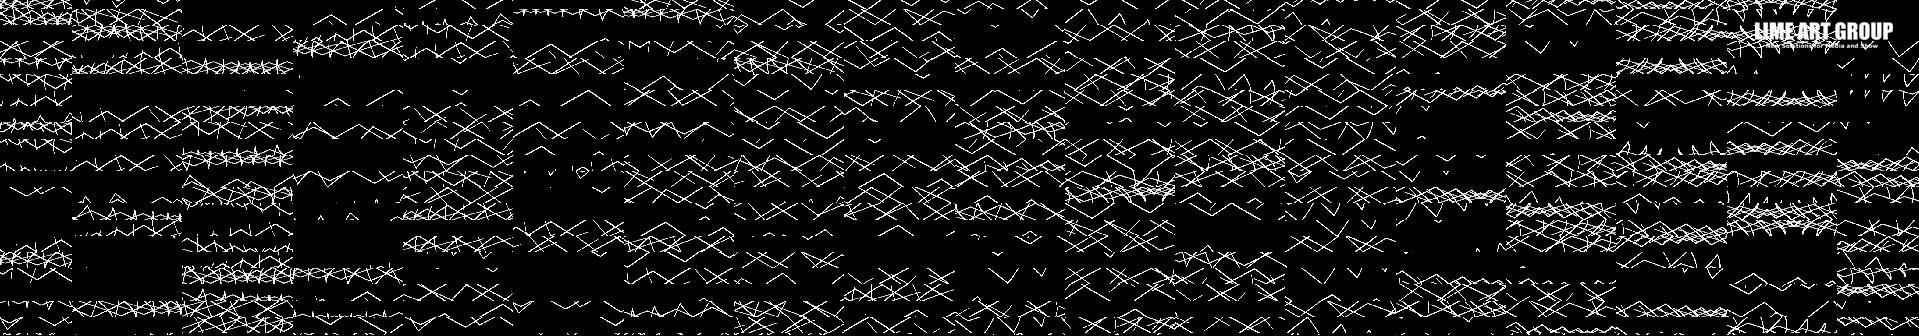 candy vj loops motion background video loop 1